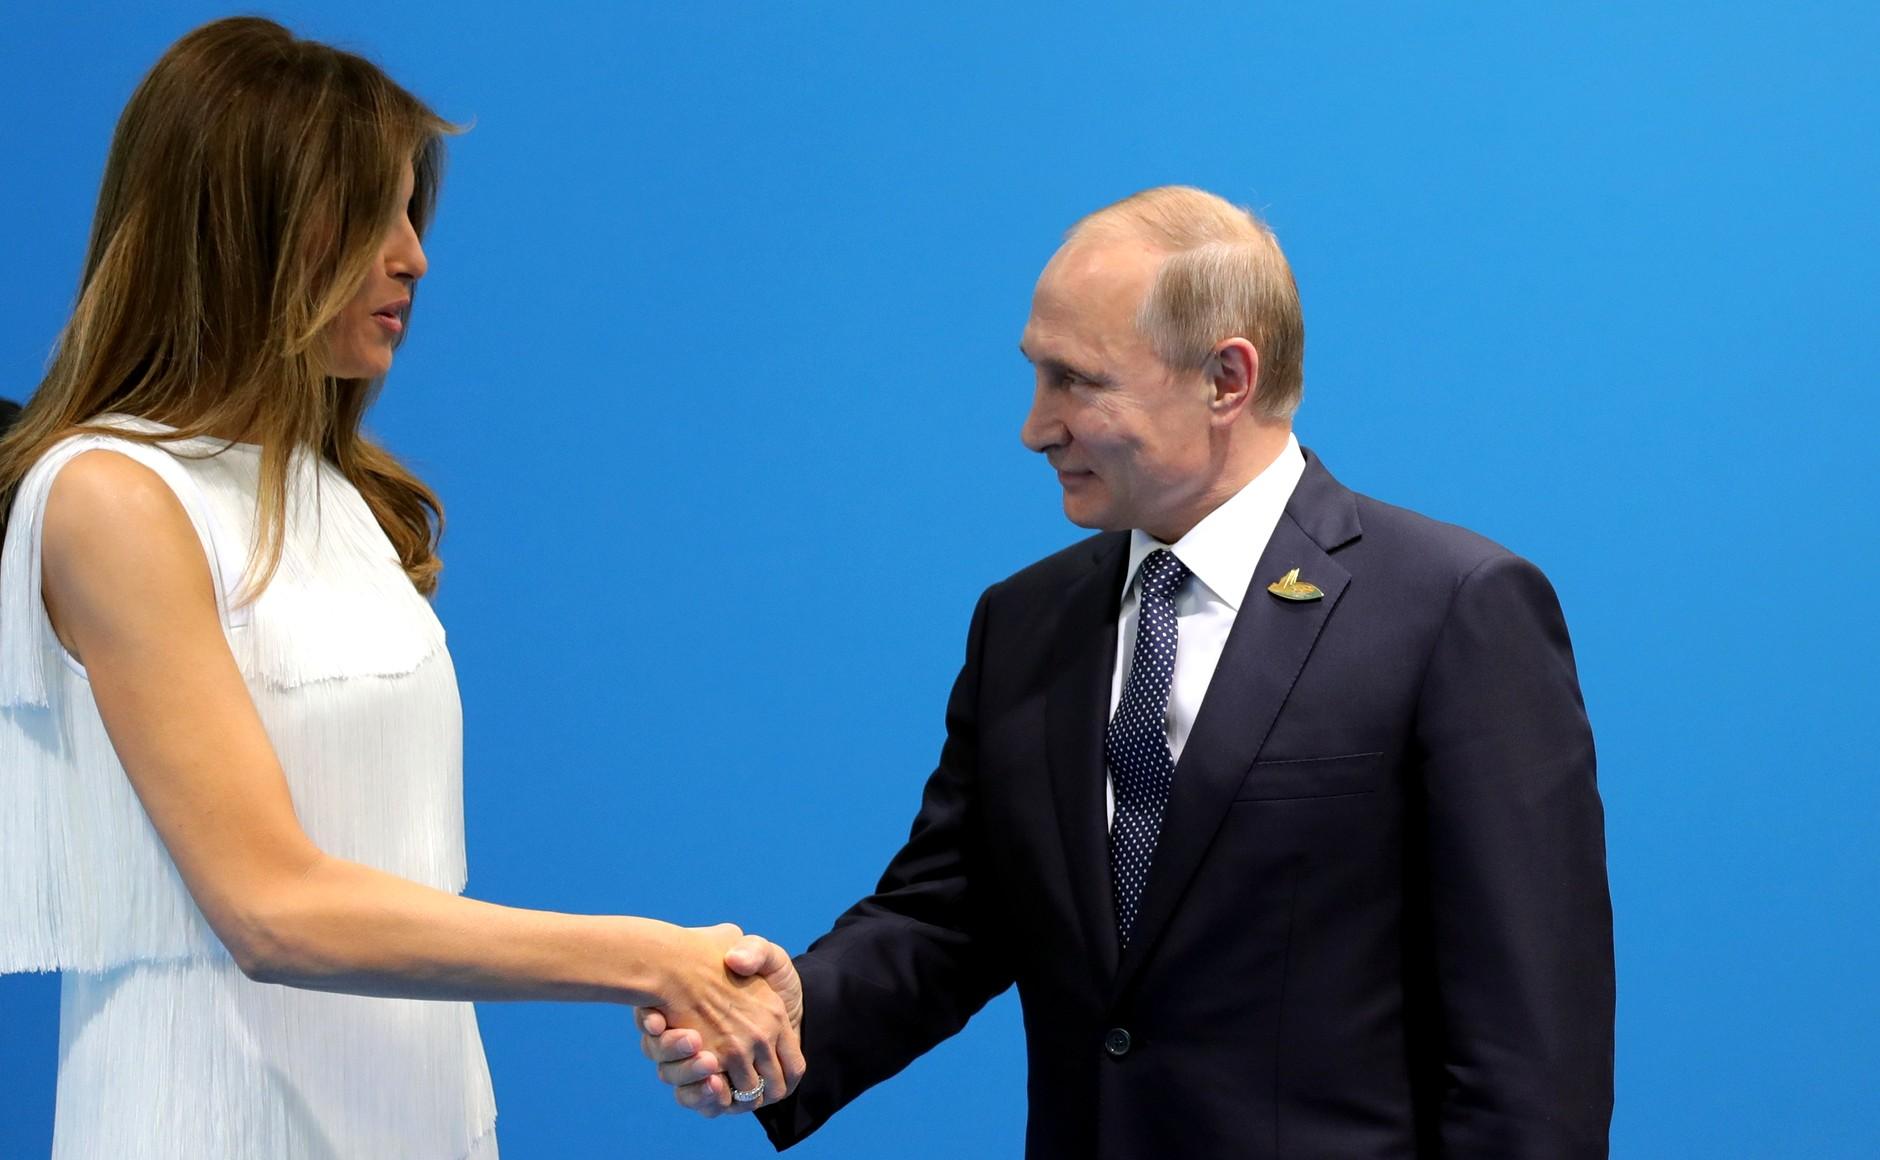 File:Vladimir Putin and Melania Trump (2017-07-07).jpg - Wikimedia Commons